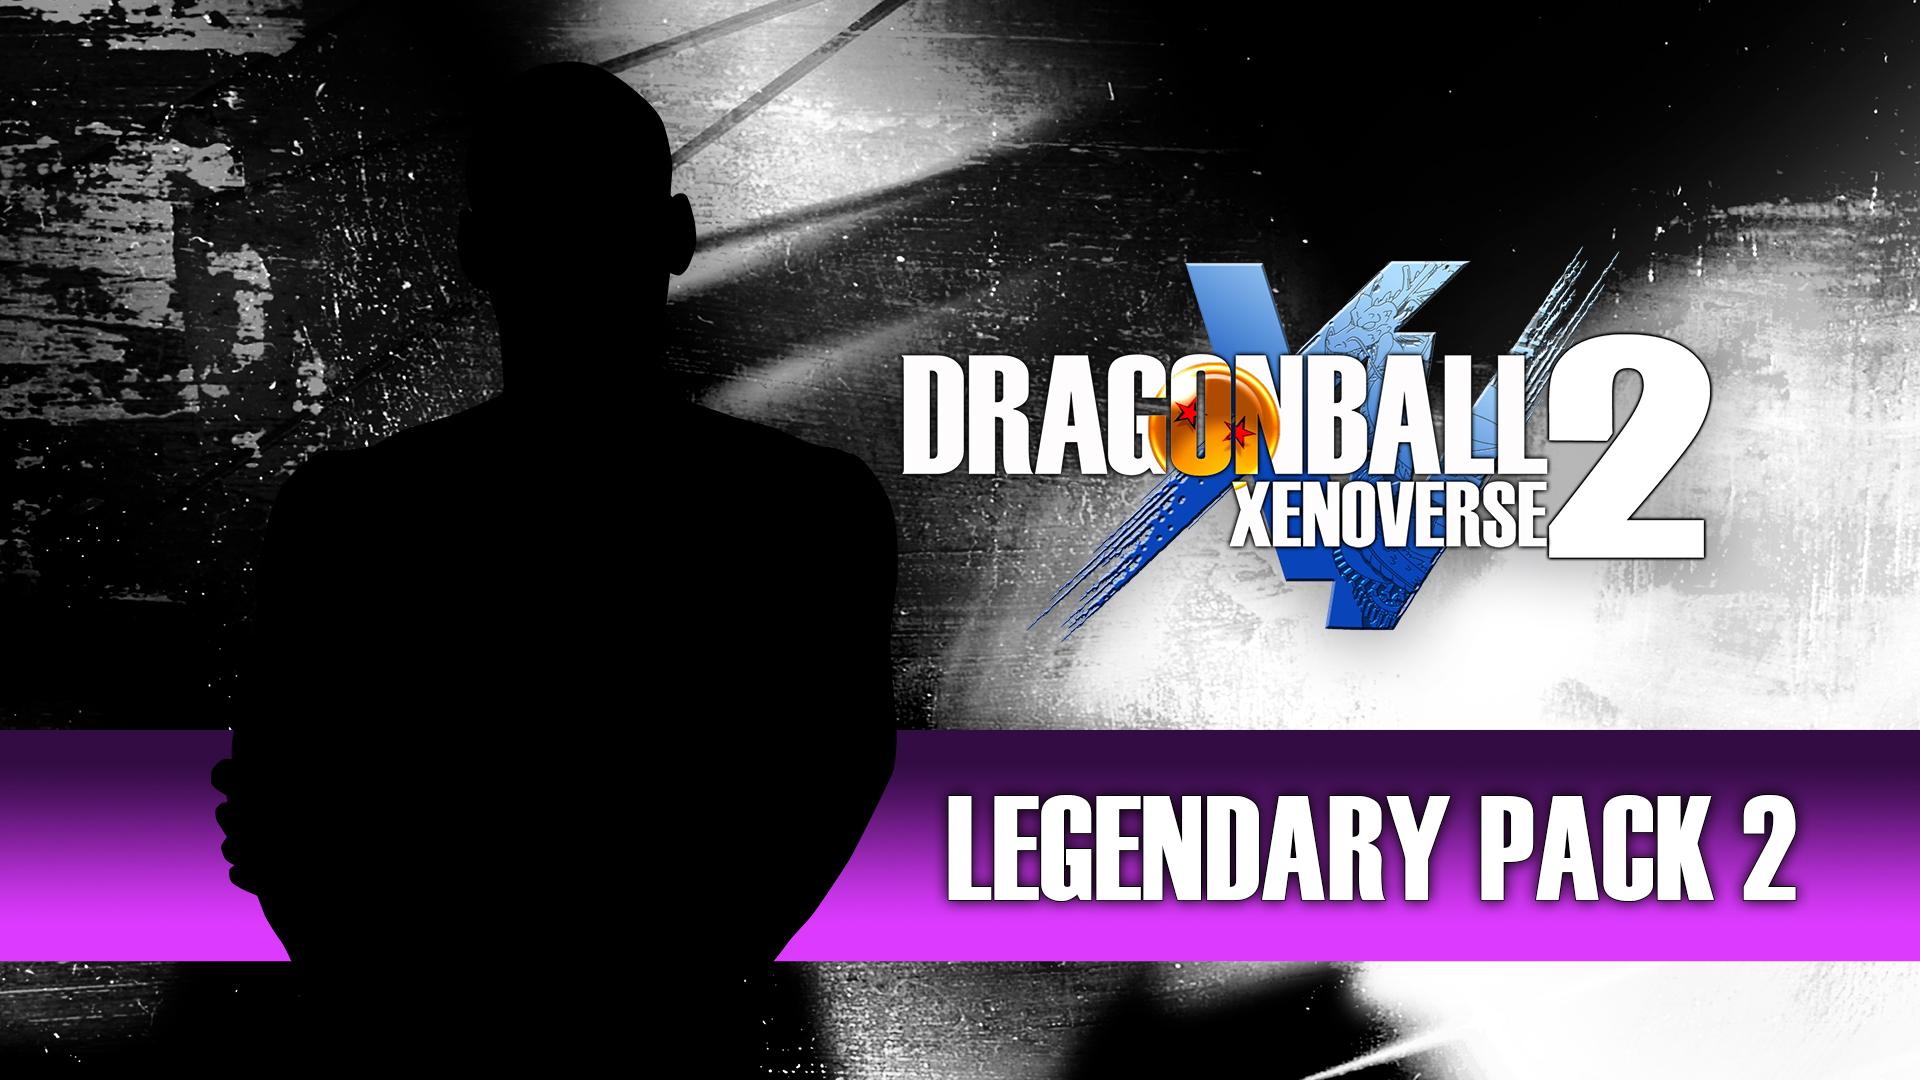 DRAGON BALL XENOVERSE 2 - Legendary Pack 2